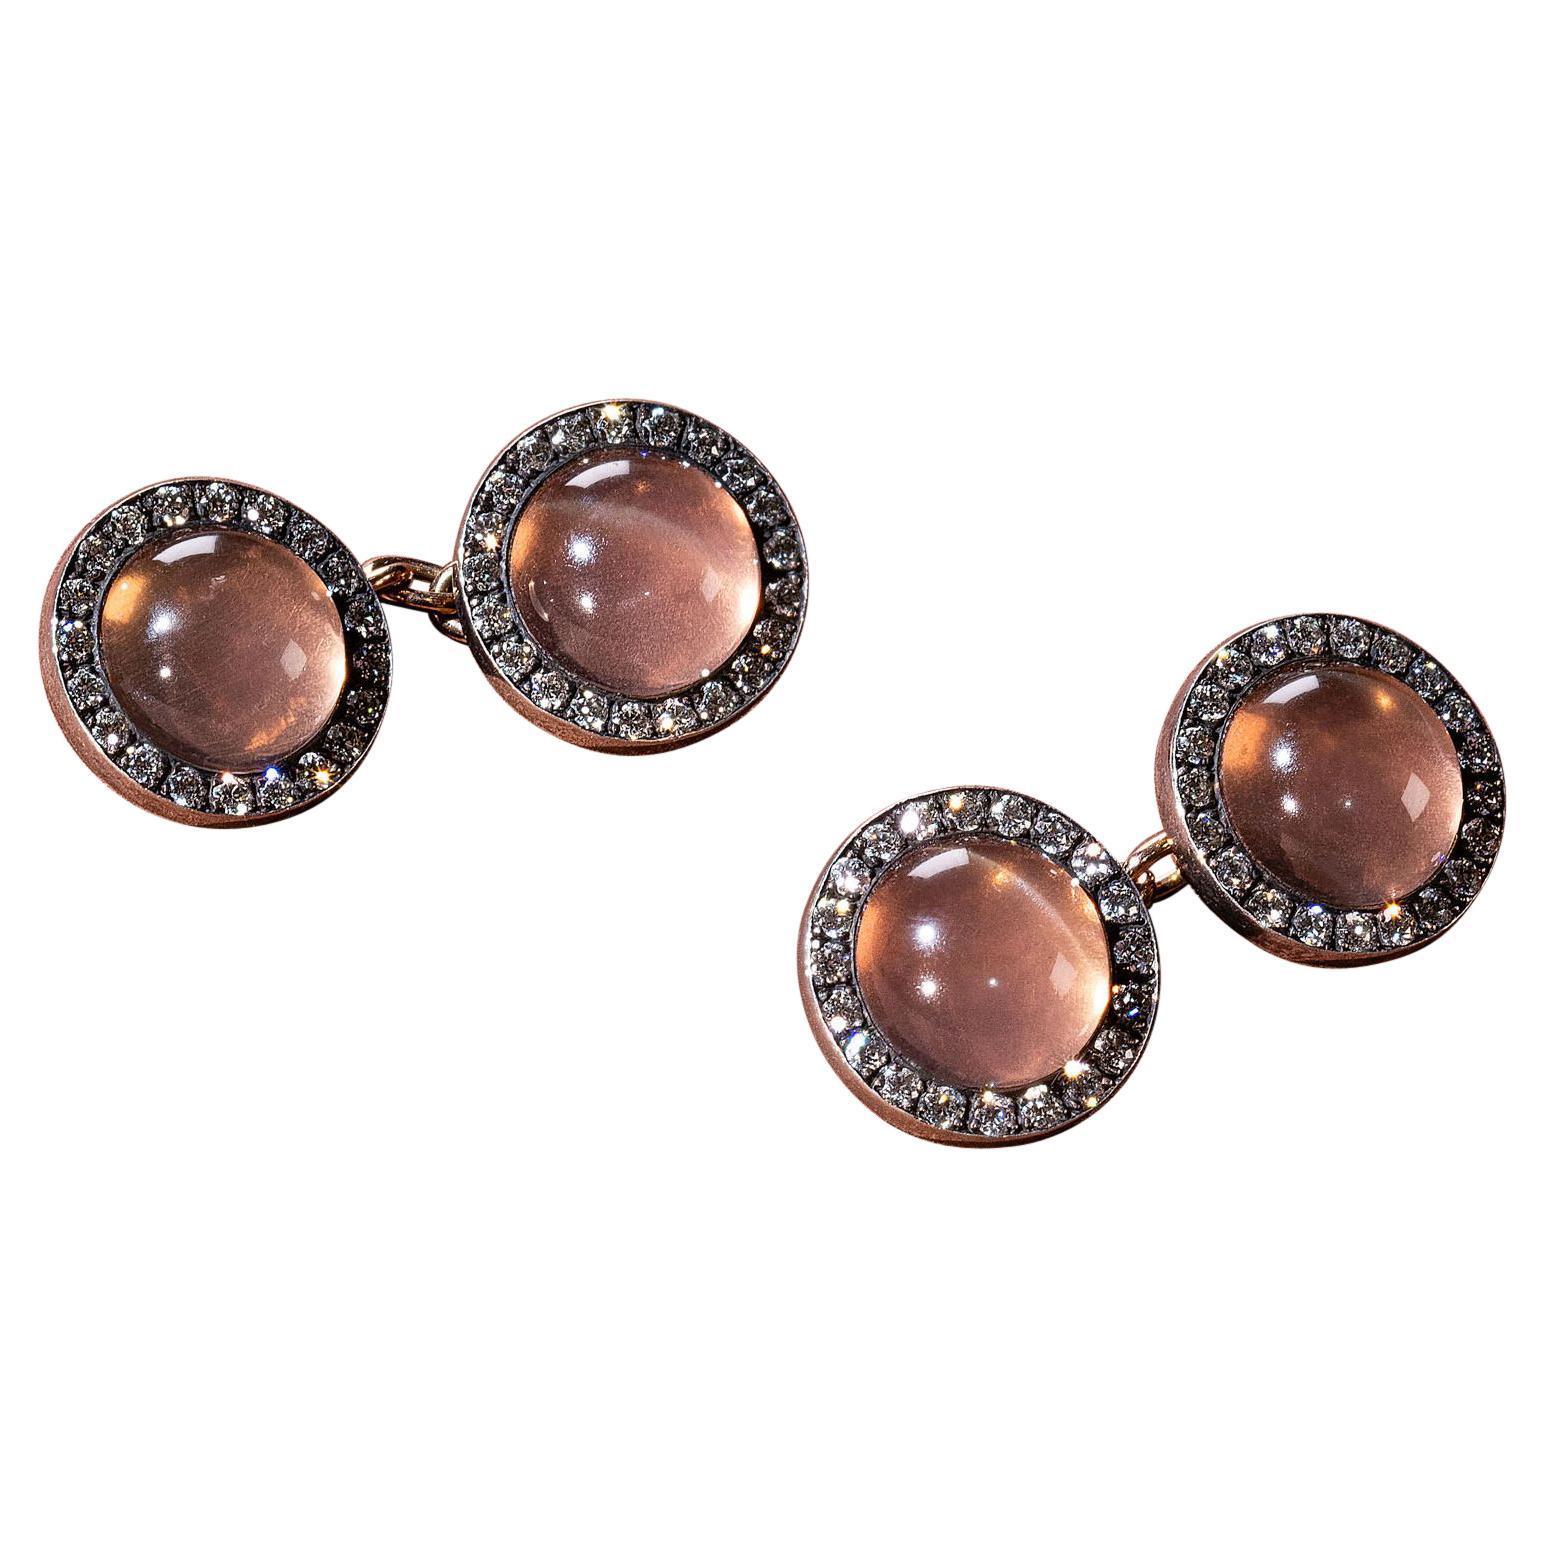 Moonstone Diamond Cufflinks, 20th Century